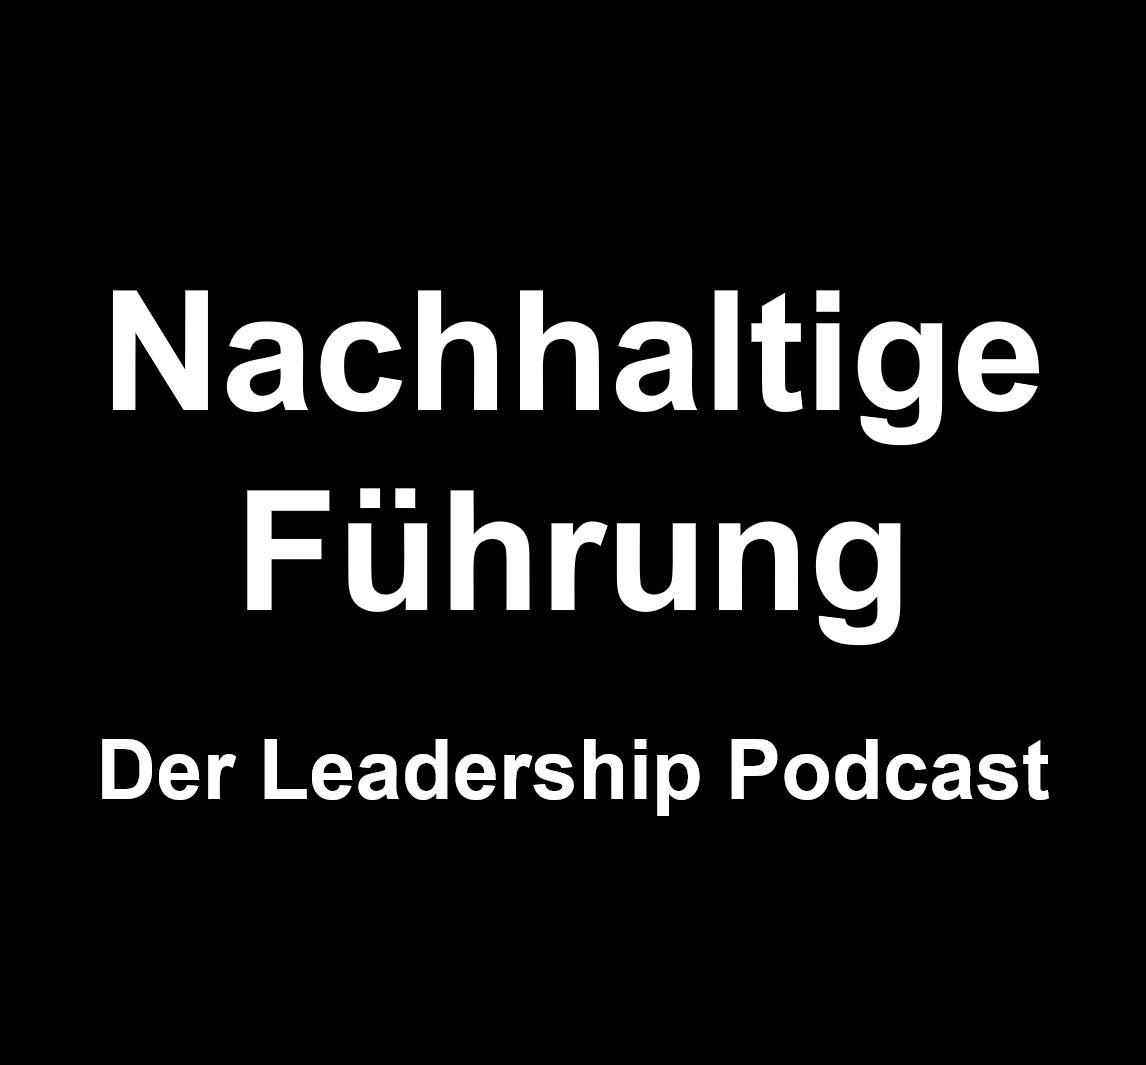 Nachhaltige Führung - Der Leadership Podcast mit Niels Brabandt / NB Networks show art